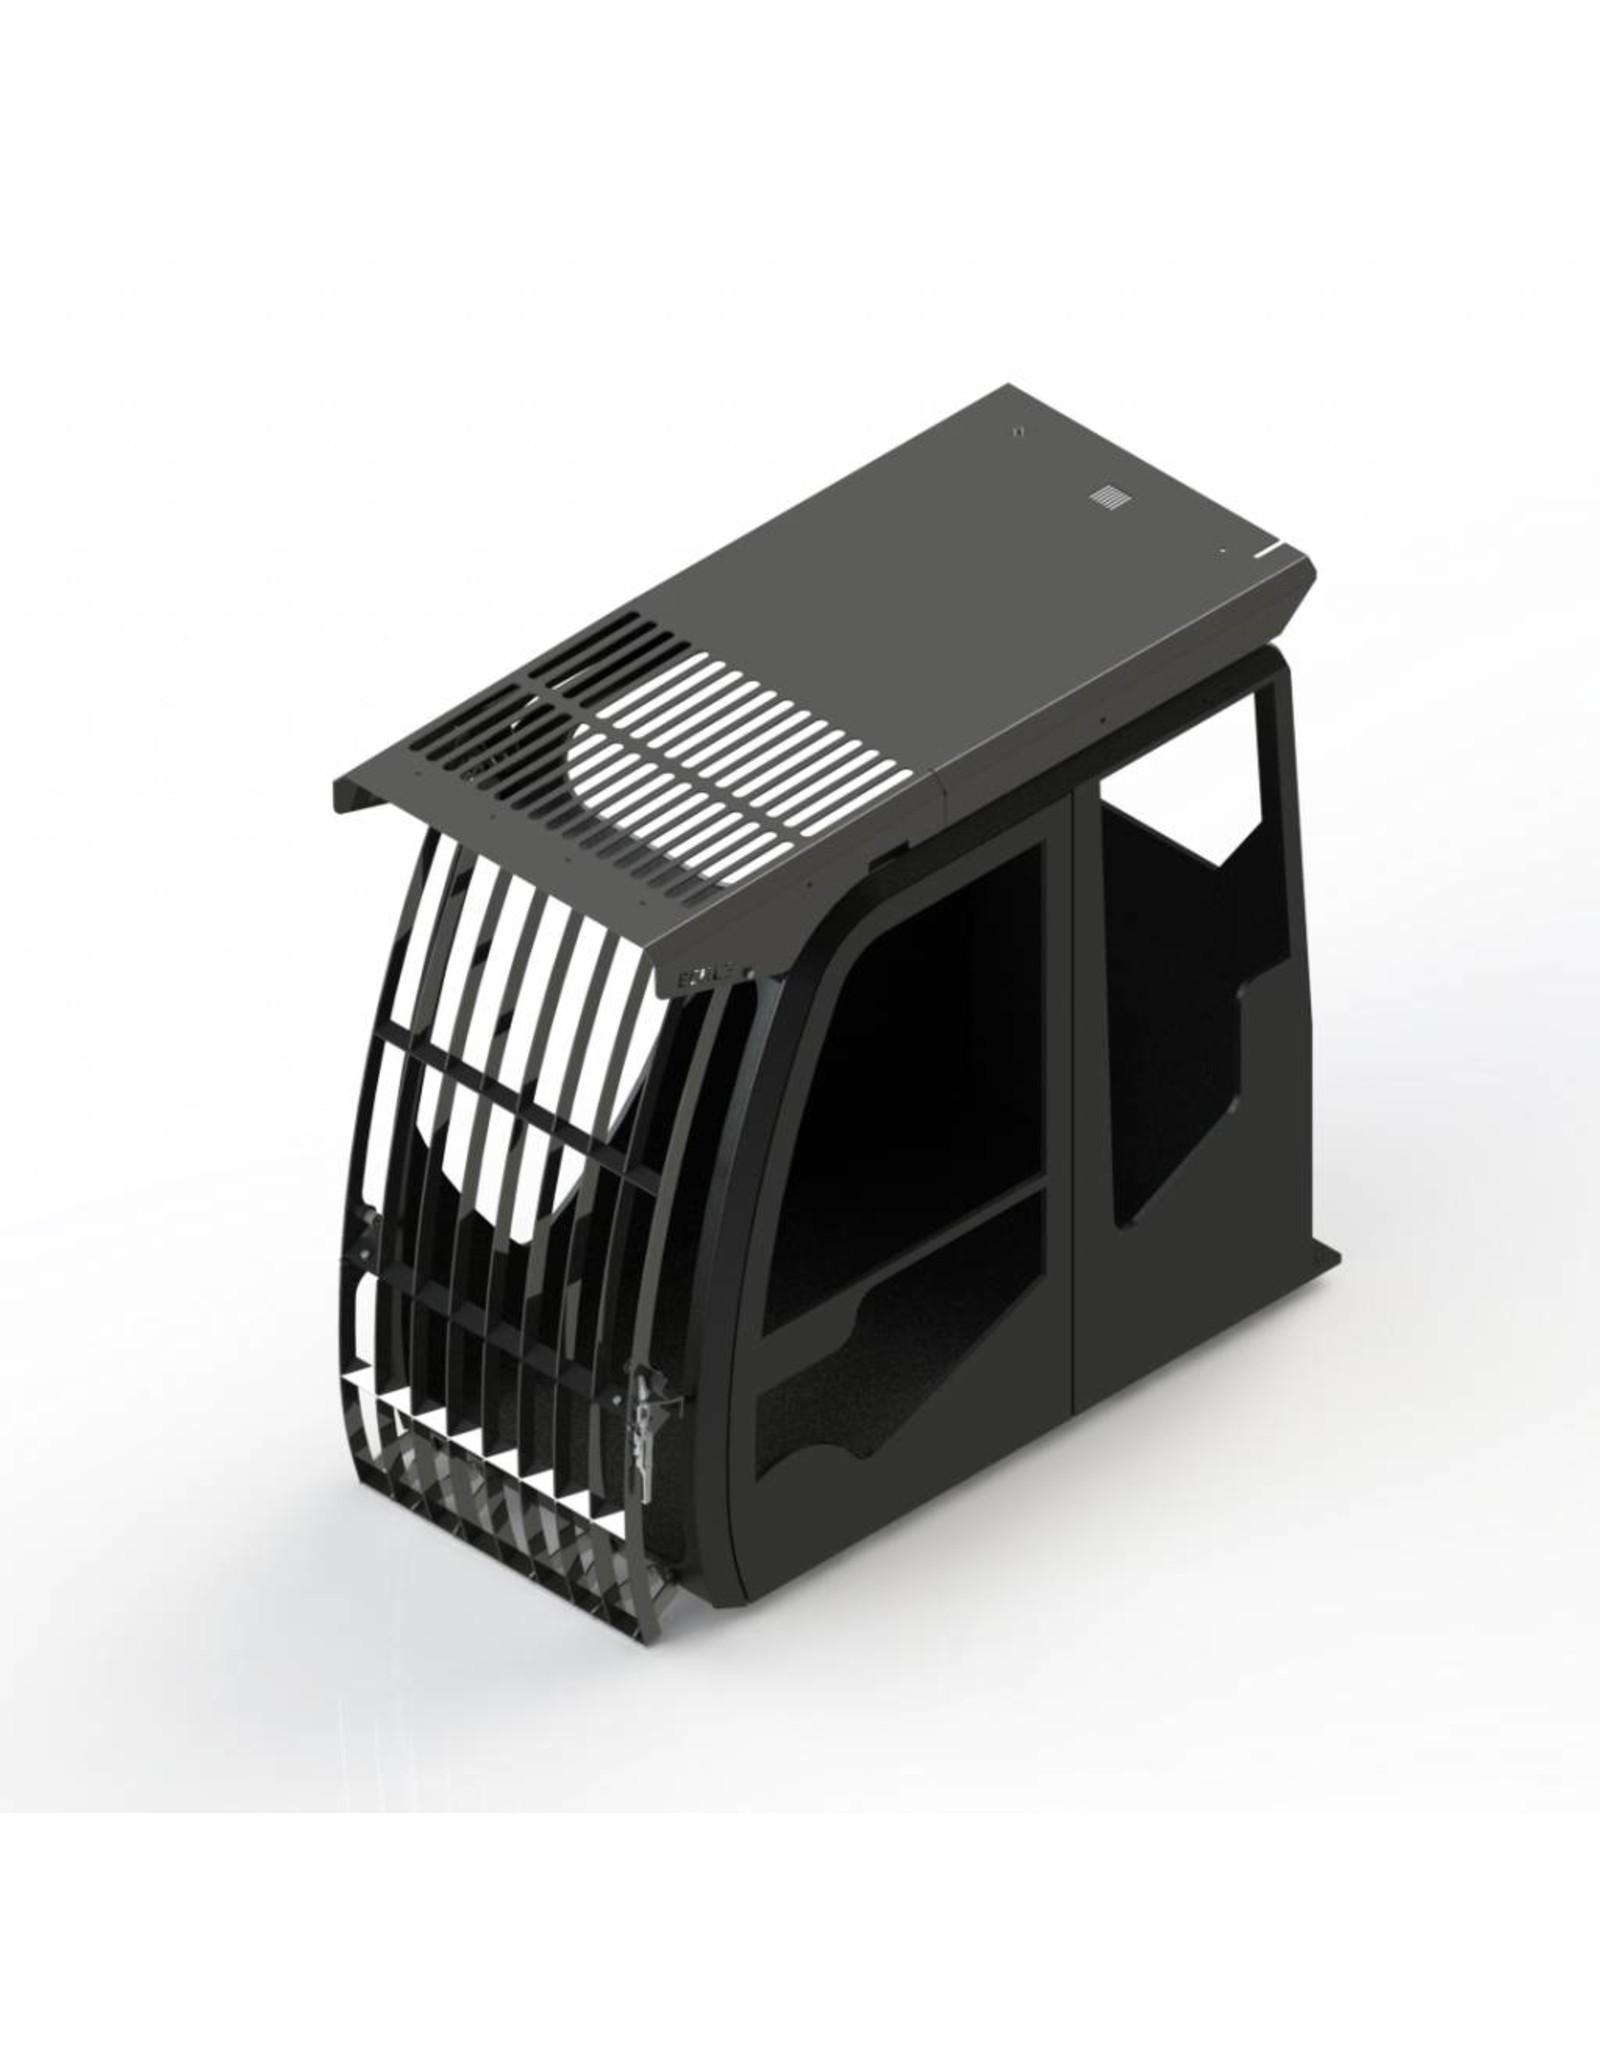 Echle Hartstahl GmbH FOPS for Doosan DX190W-5